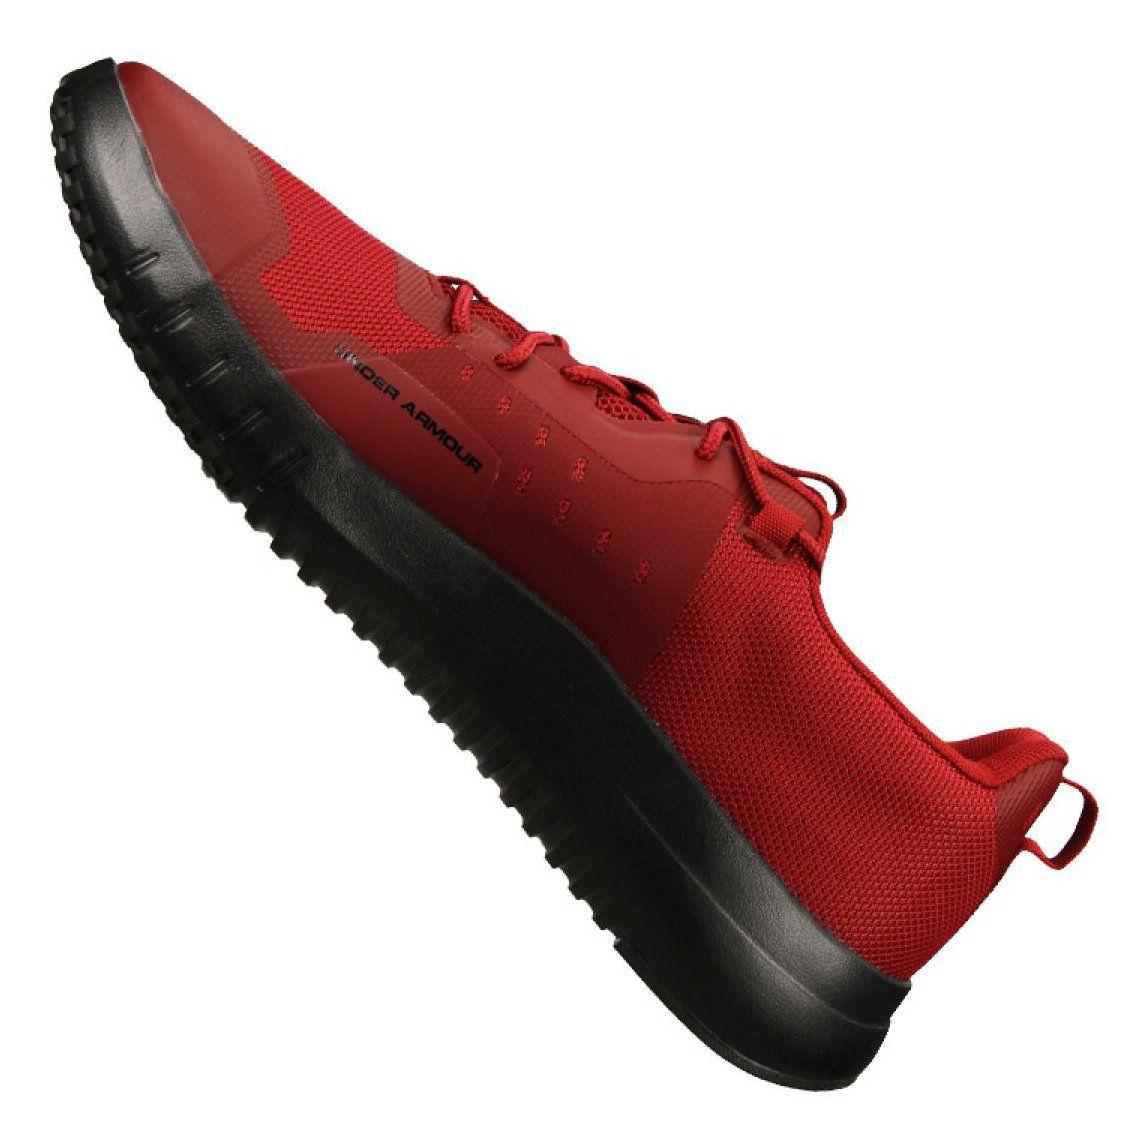 Buty Treningowe Under Armour Tr96 M 3021296 600 Czerwone Training Shoes Under Armour Shoes